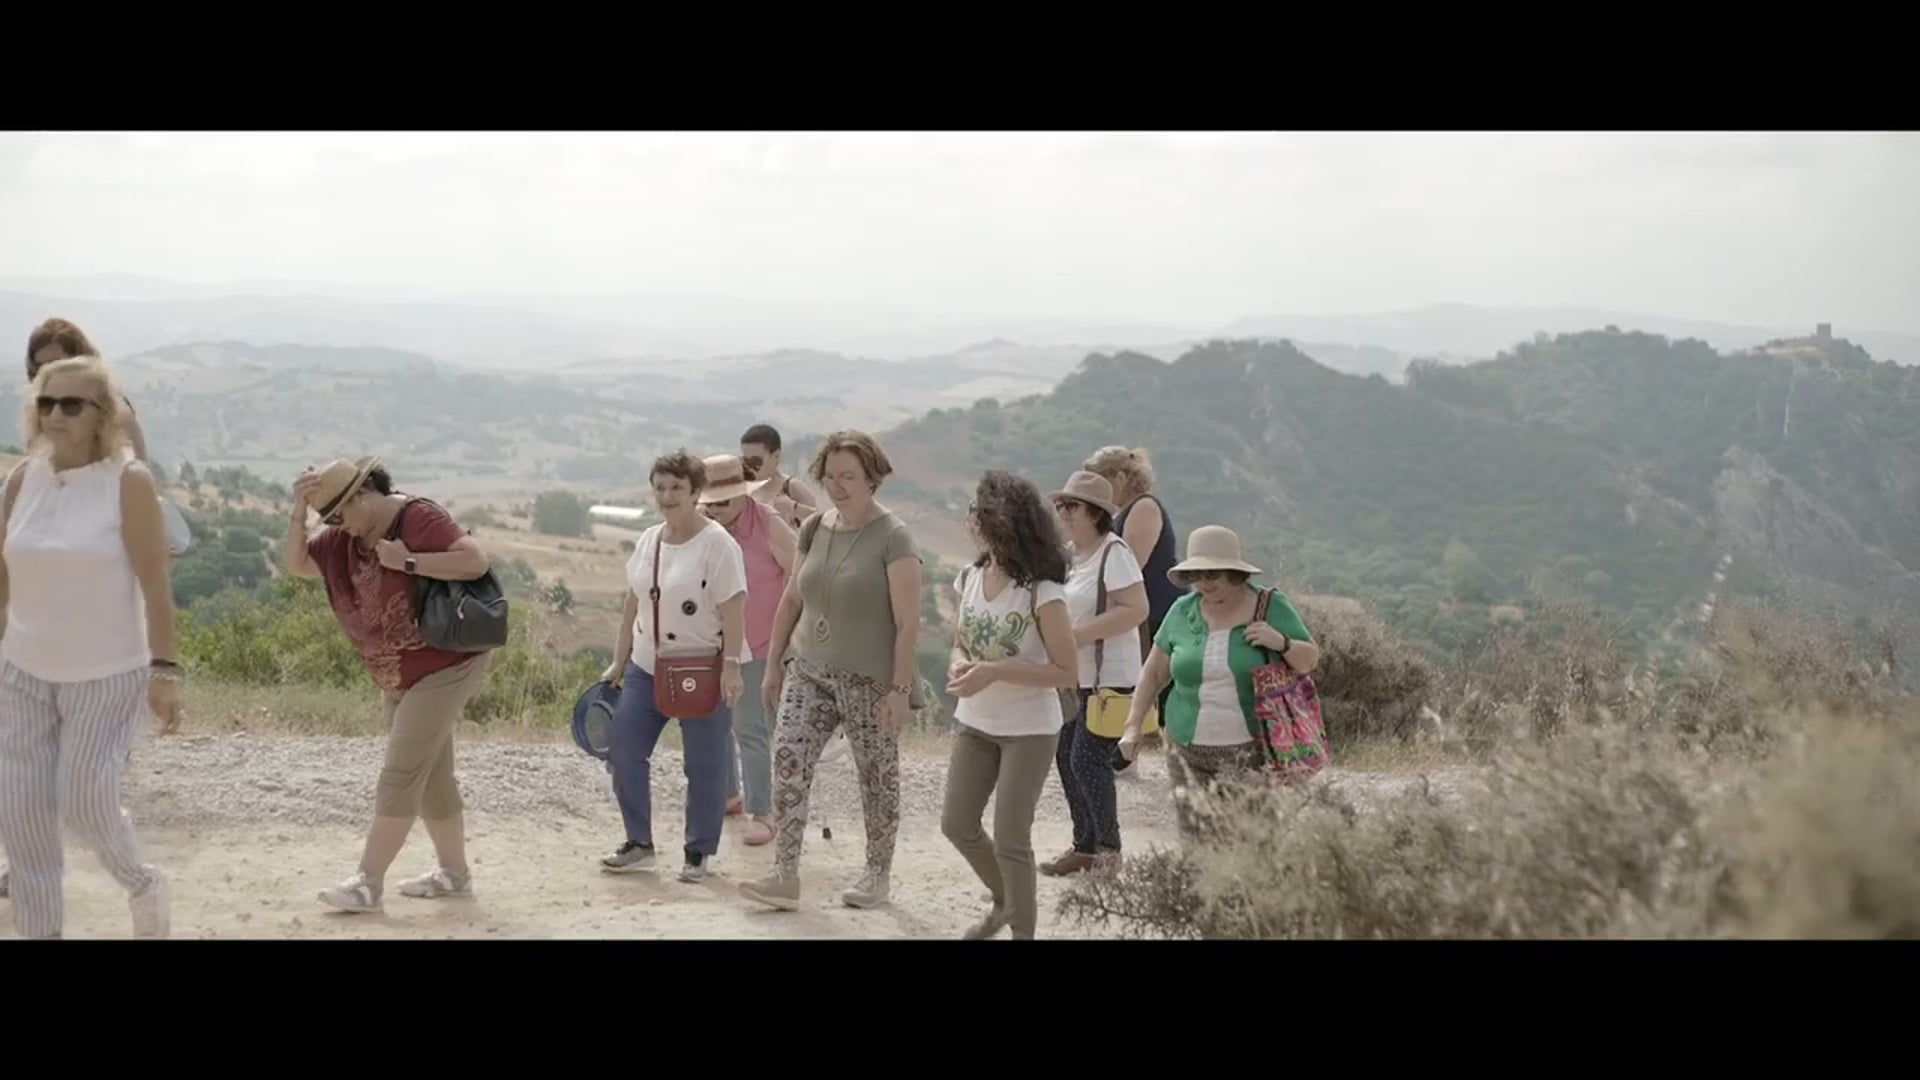 Viaje al Despertar - Trailer